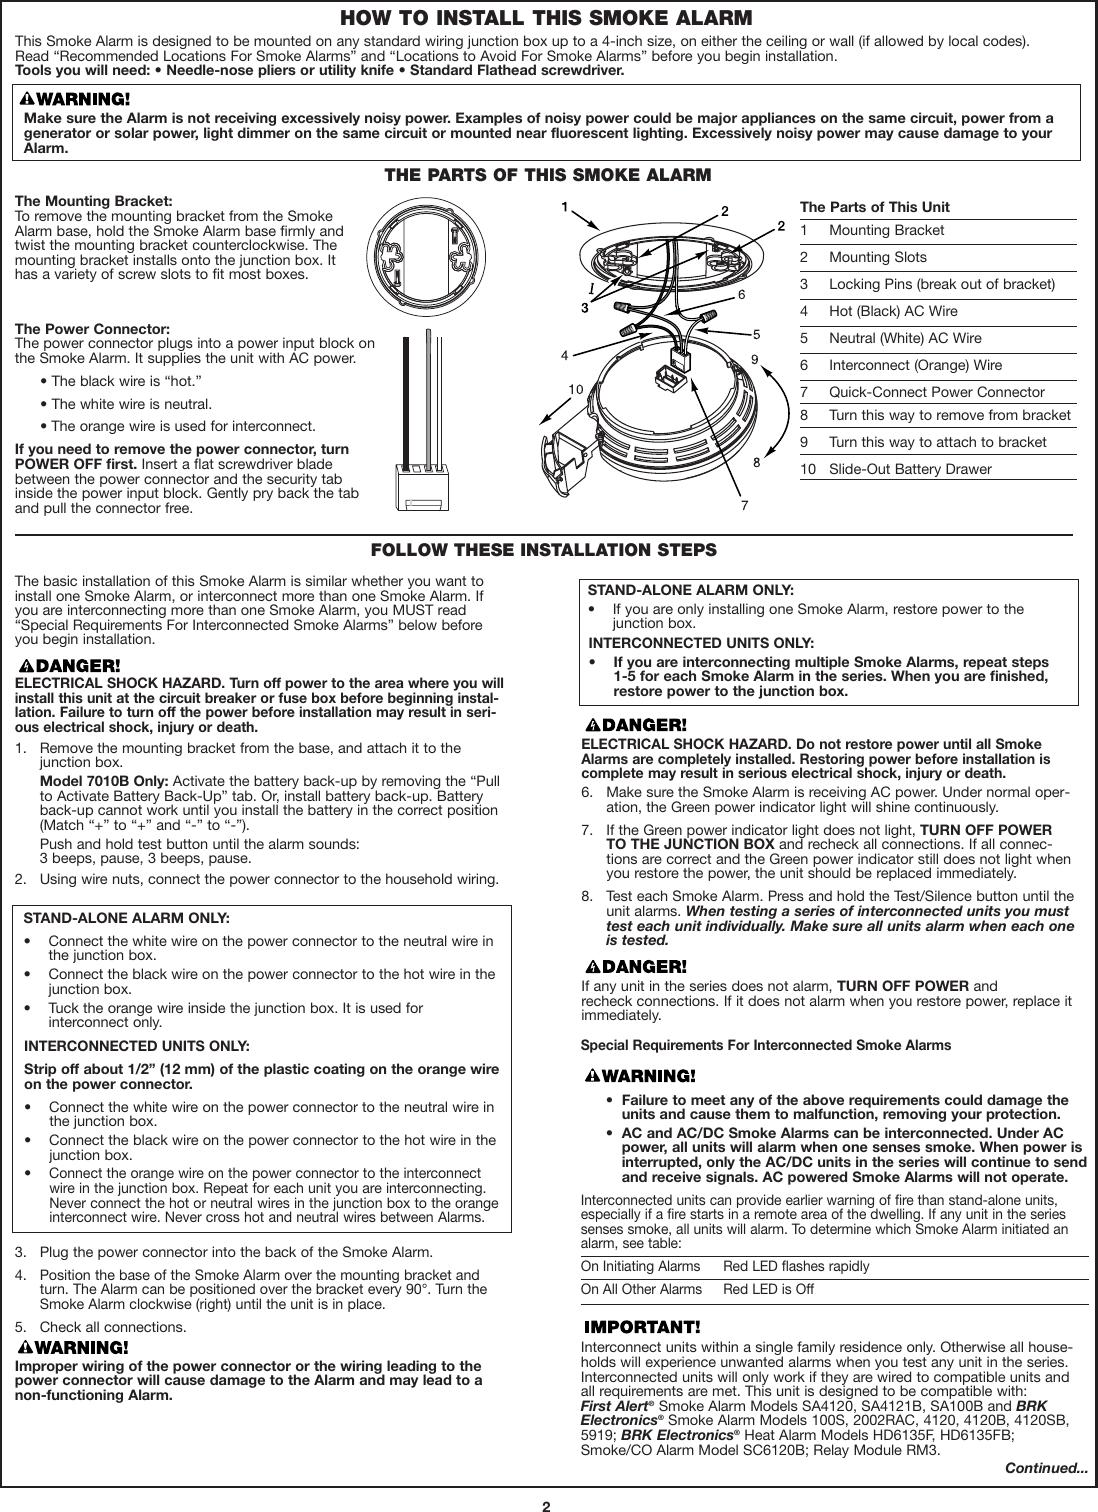 Brk Electronic 7010 Users Manual M08_0050_000_E(7010)WEB